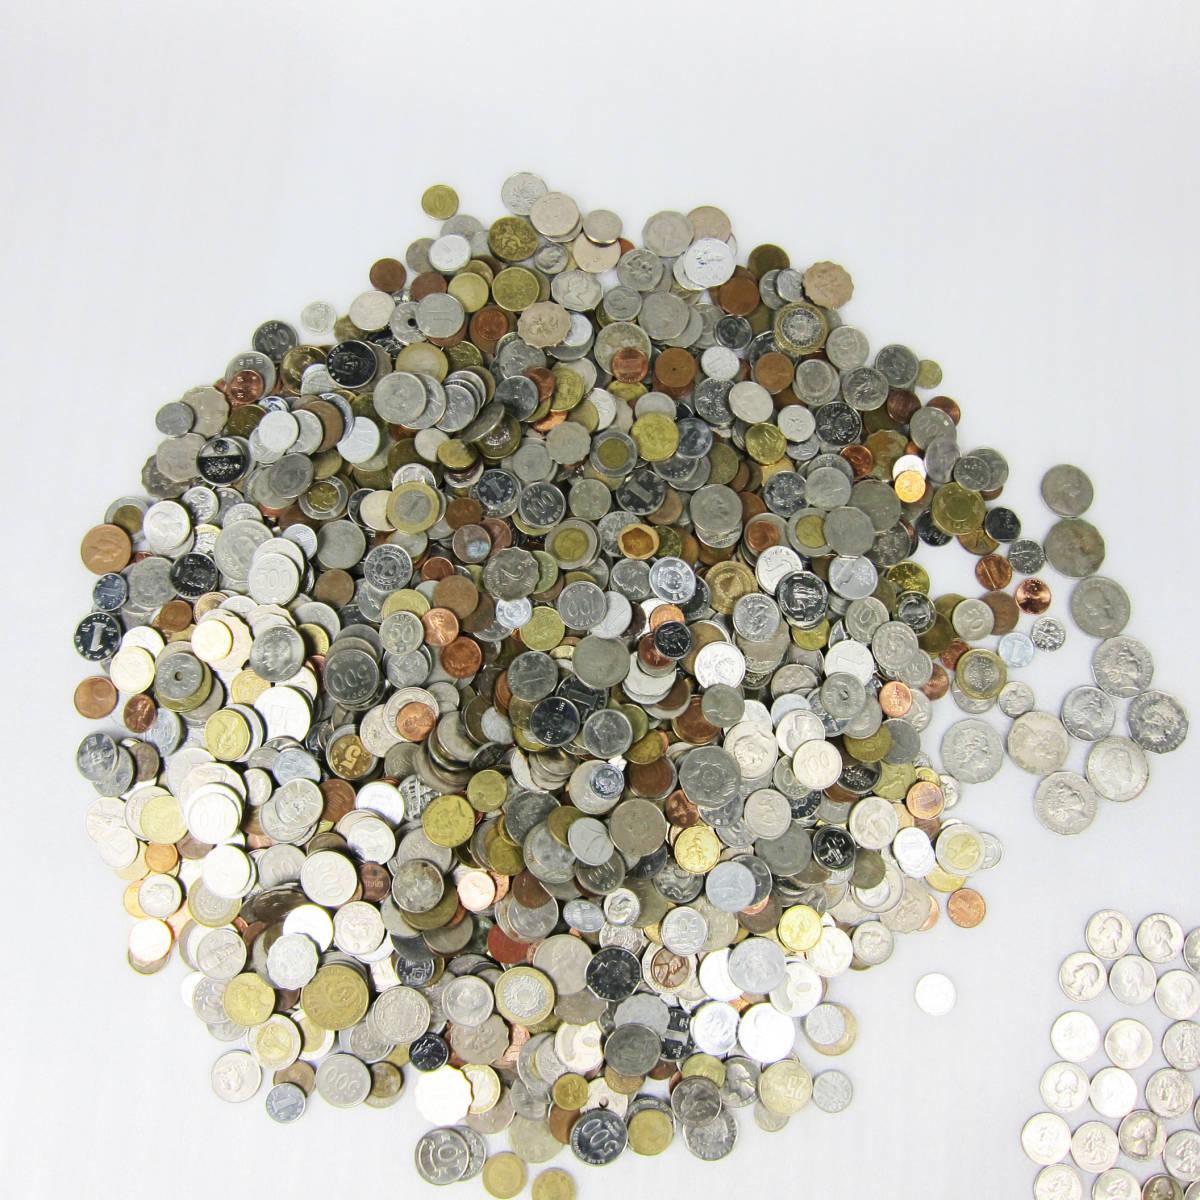 M4023●外国硬貨1円スタート第八弾 大量 詰め合わせ 約10Kg USリバティコイン他 欧米 アジア オセアニア 世界のコイン